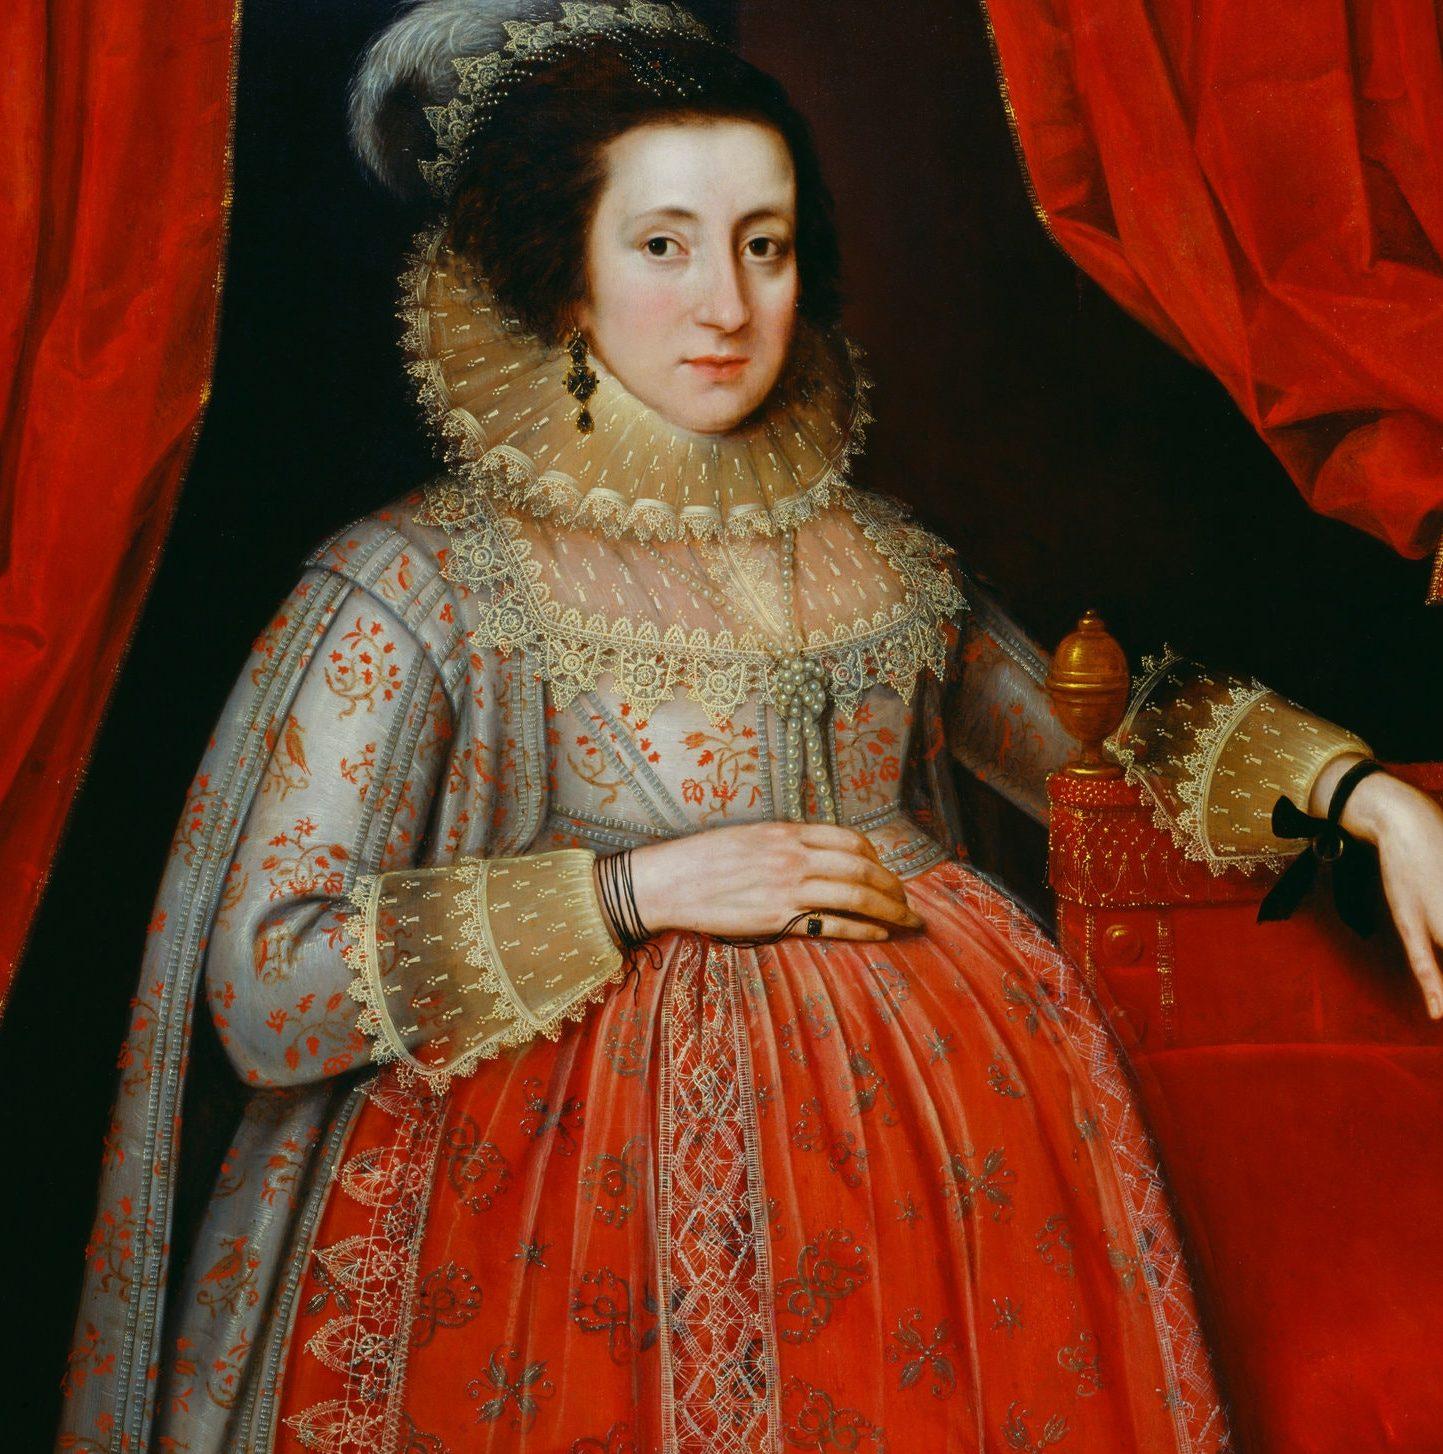 Portraying Pregnancy - art history, Women